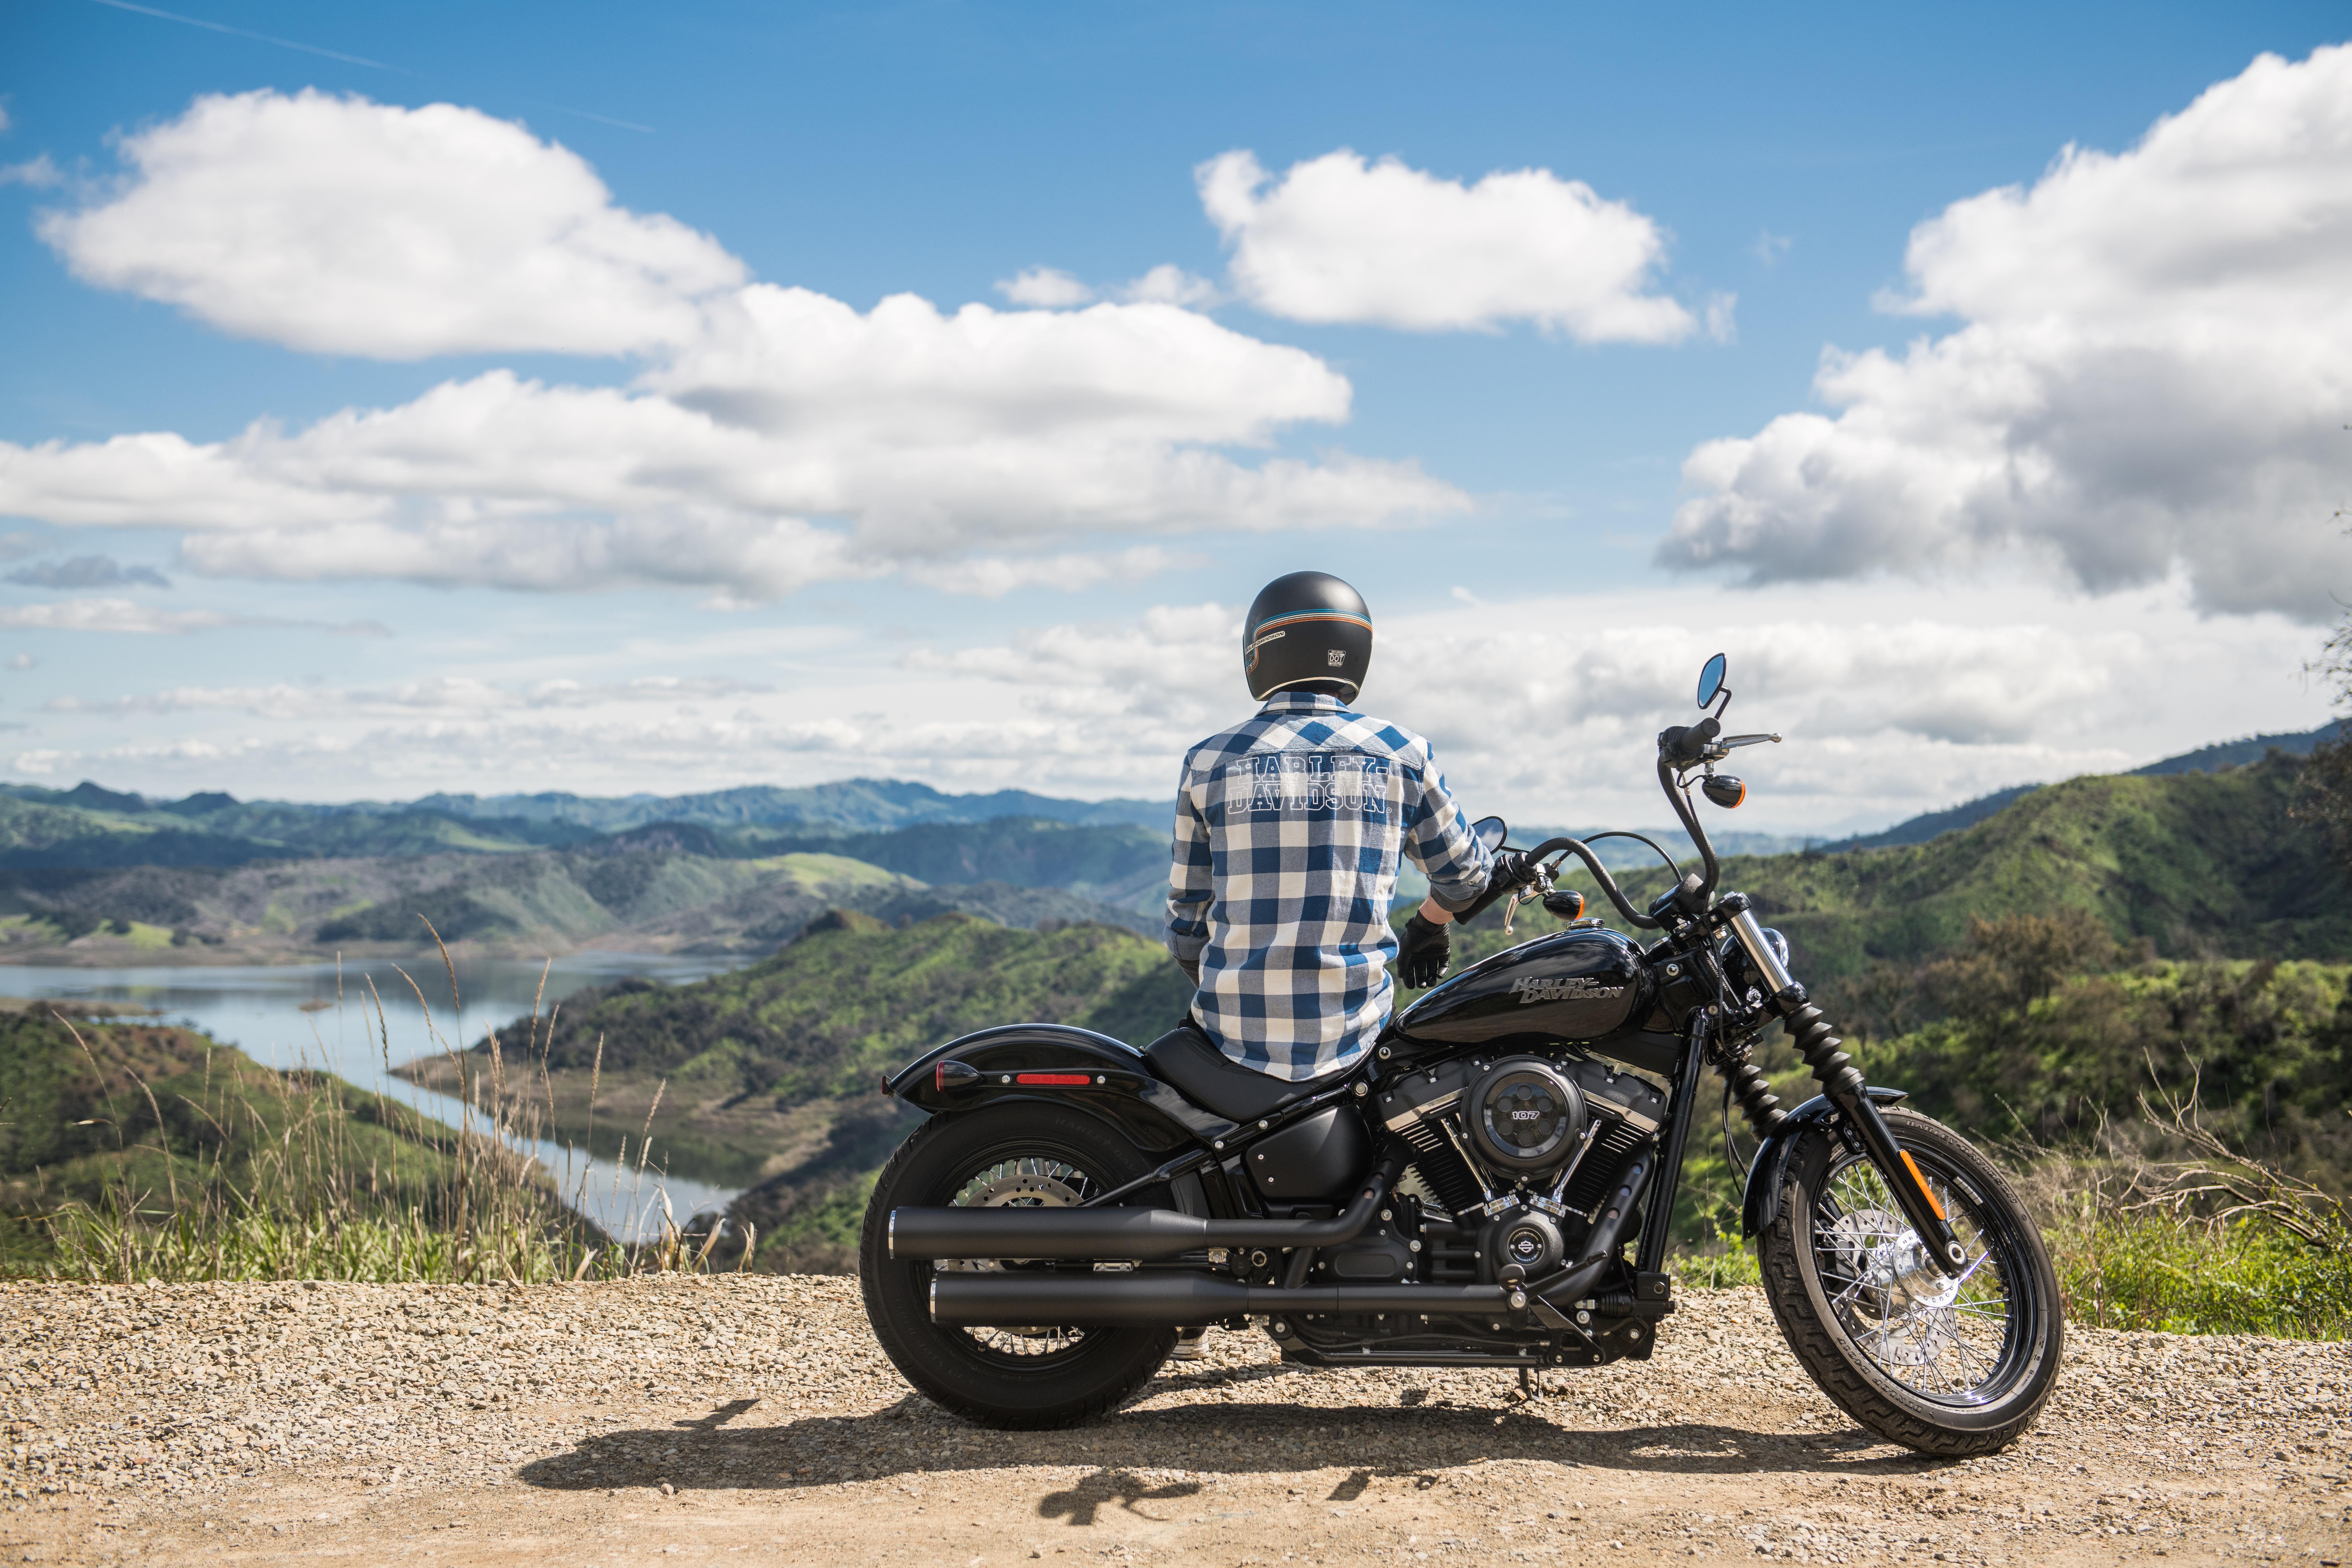 Motorcycle Insurance In Santa Barbara